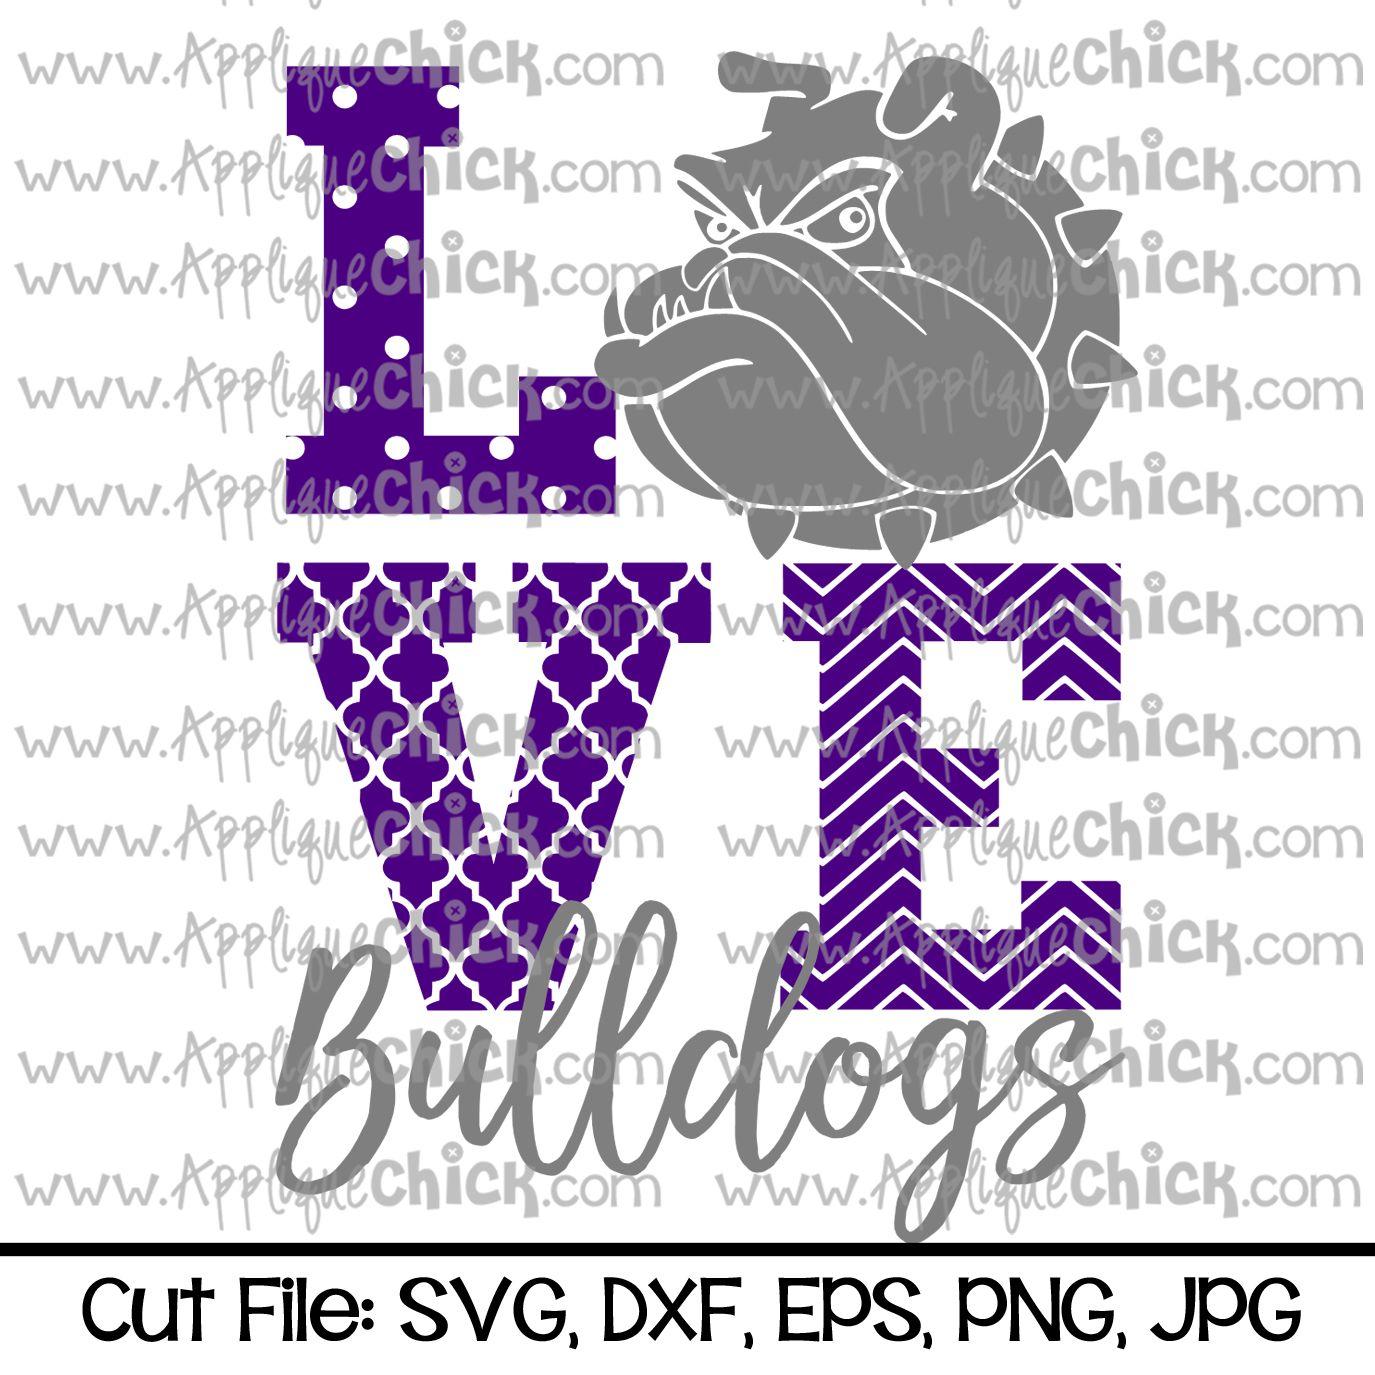 Download Love Bulldogs SVG   Spirit shirts, School spirit shirts ...